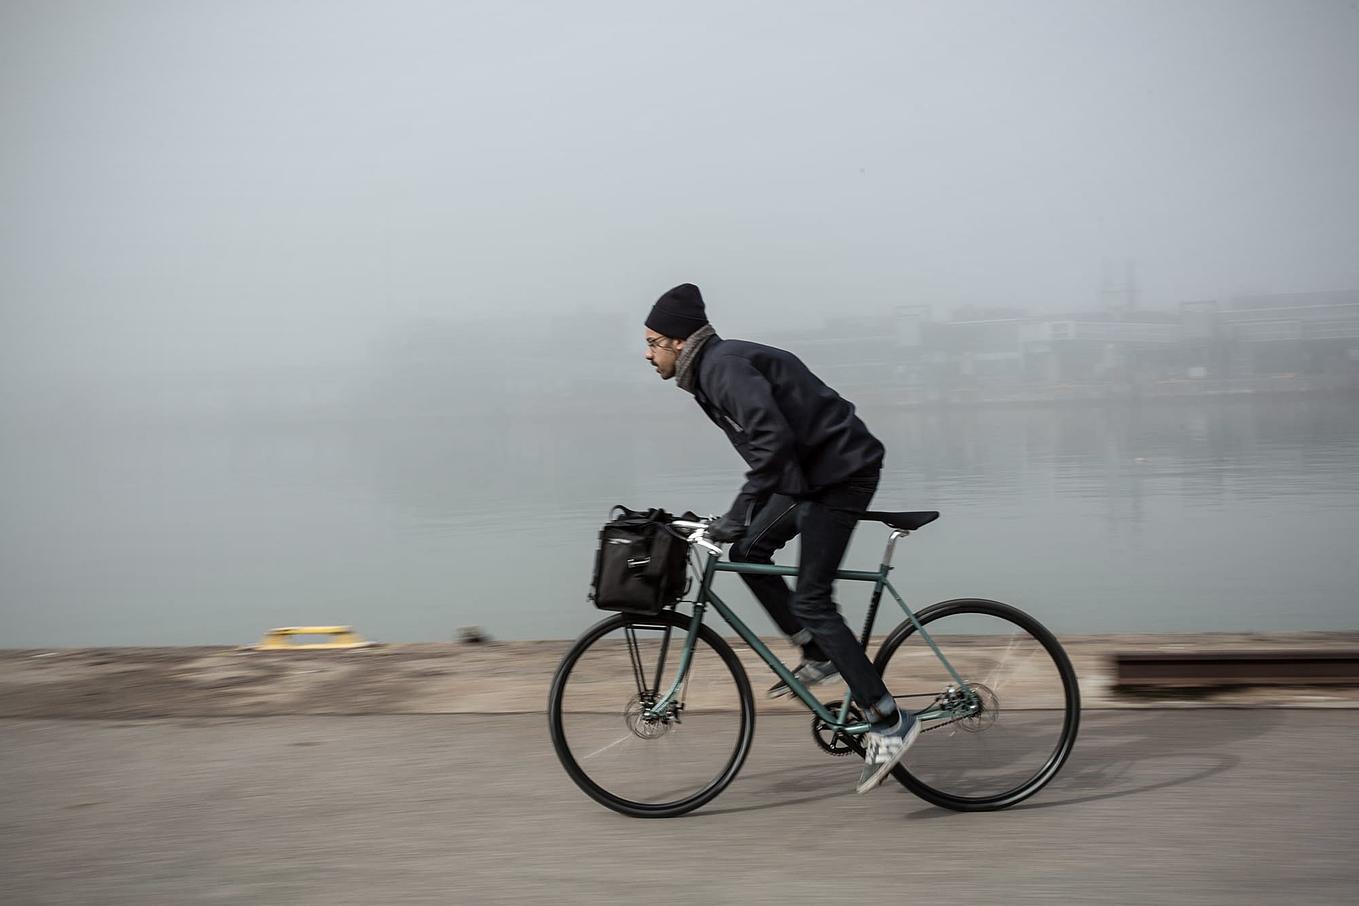 carhartt-x-pelago-bicycle-gessato-5